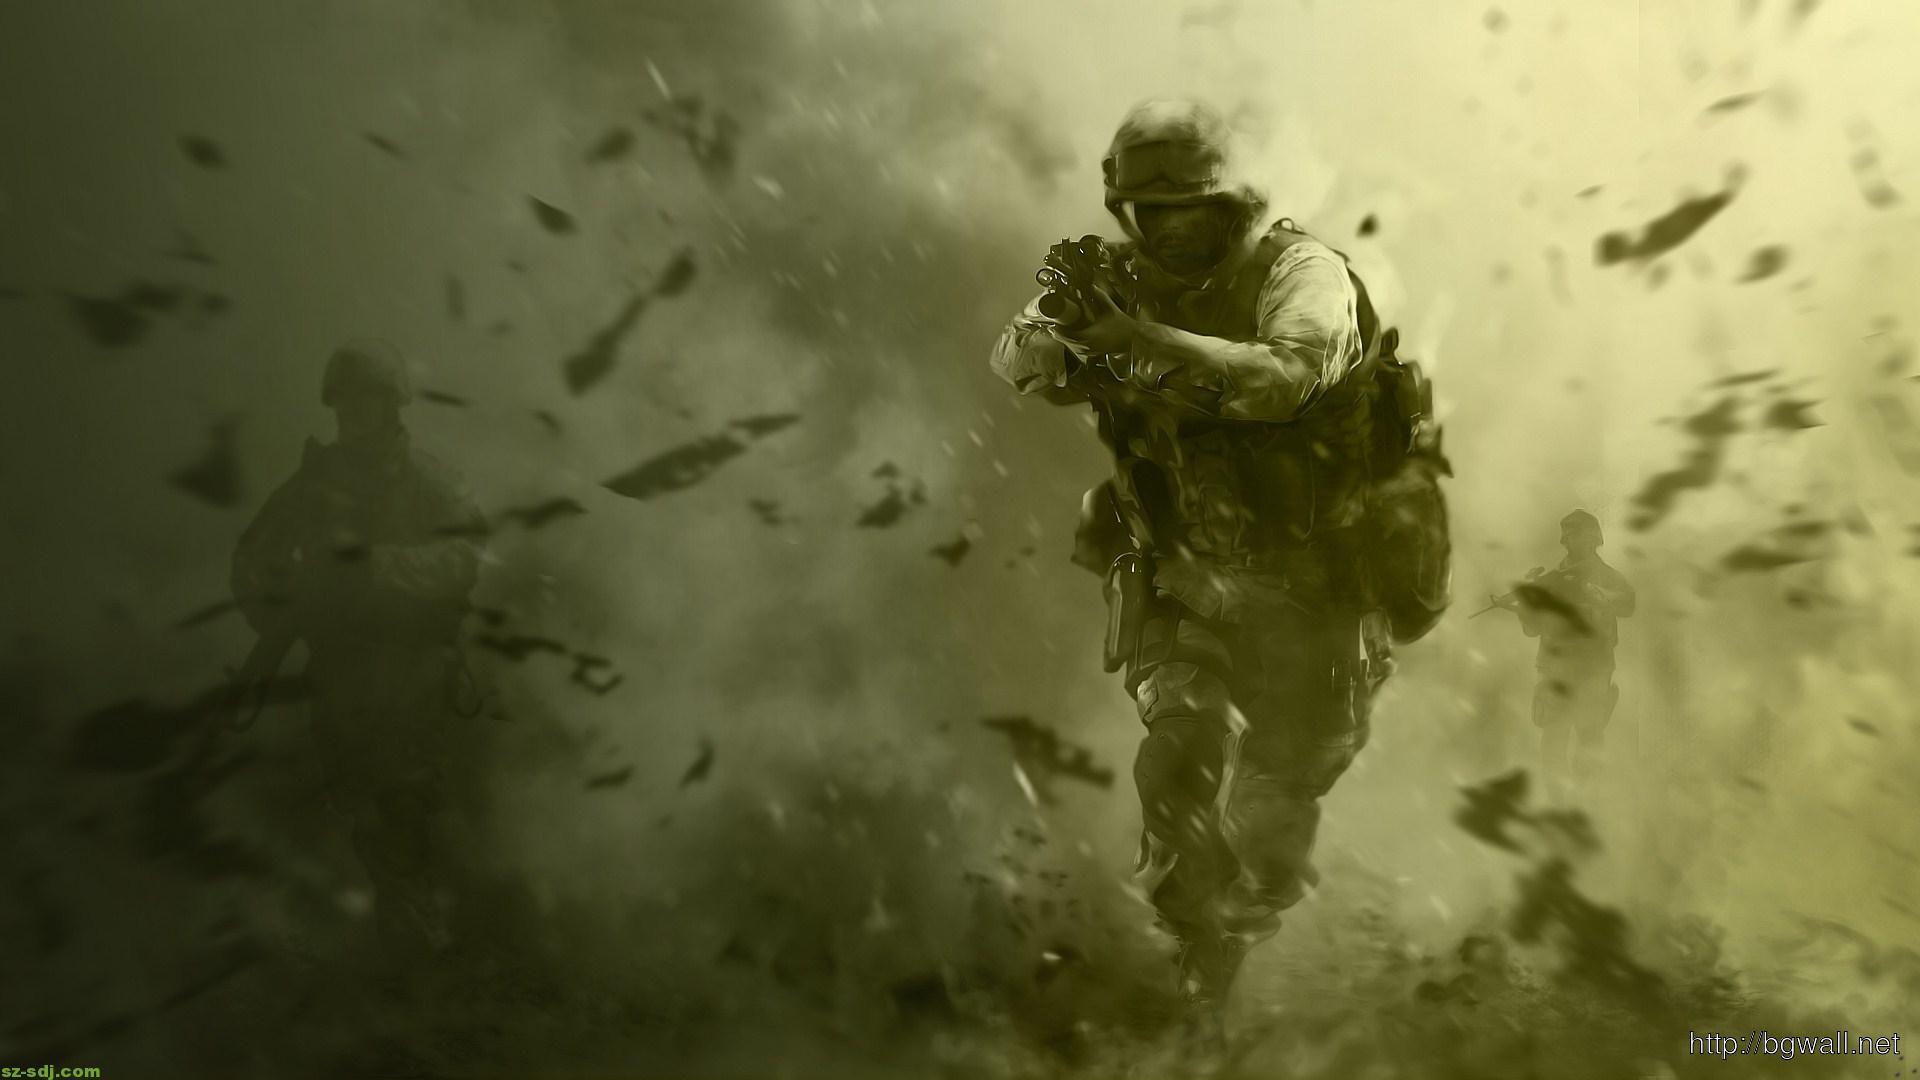 Army War Military Wallpaper Desktop